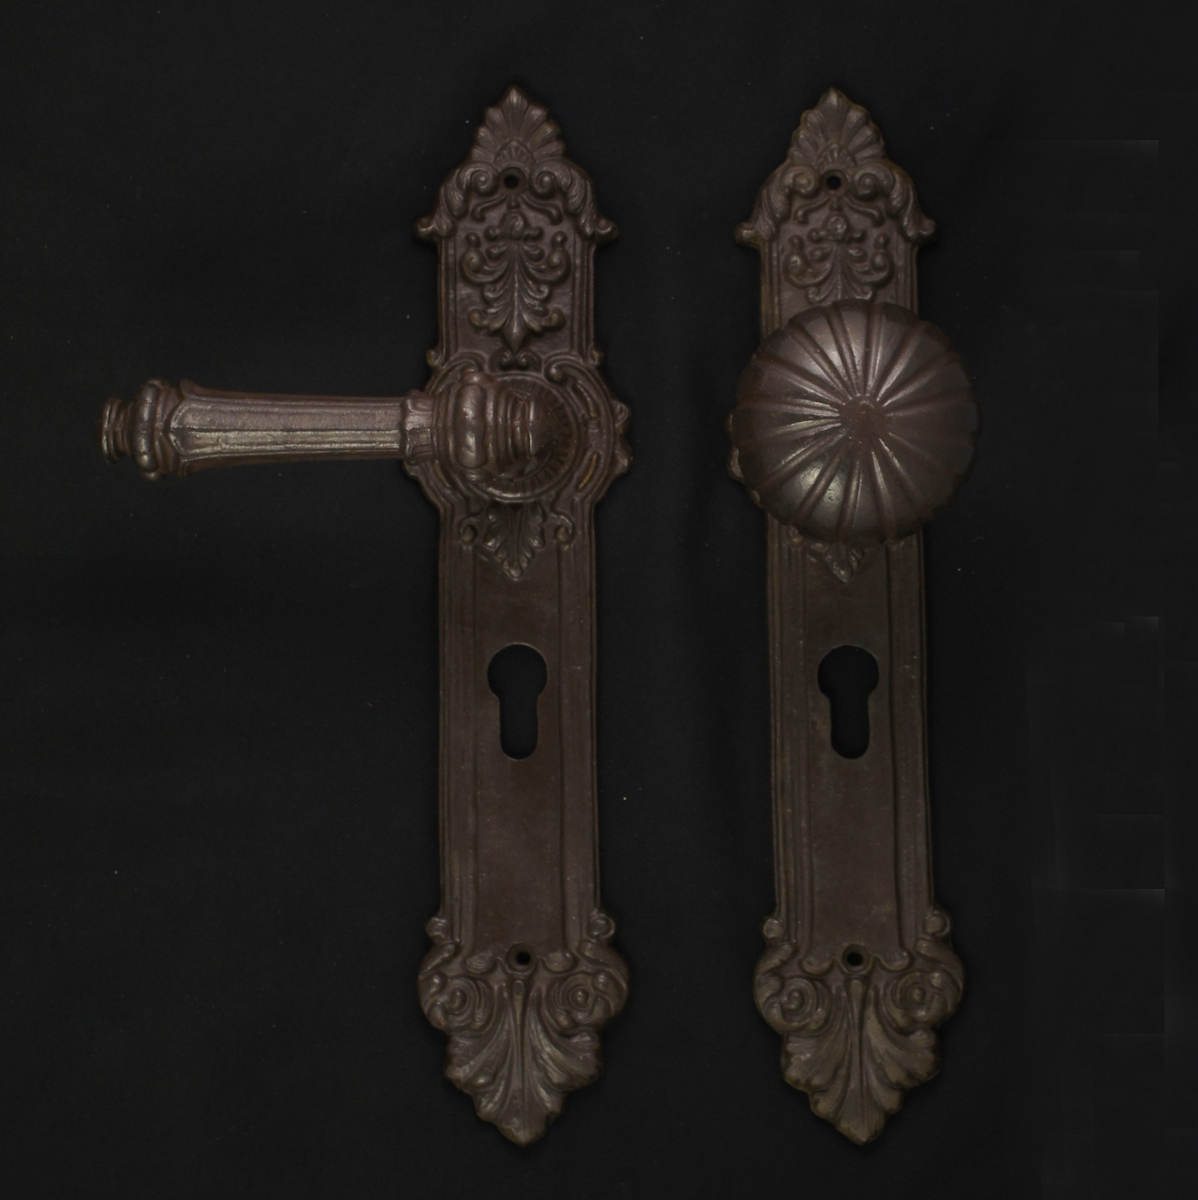 Haustürgarnitur - antike Türdrücker, Türklinken, Türbeschläge